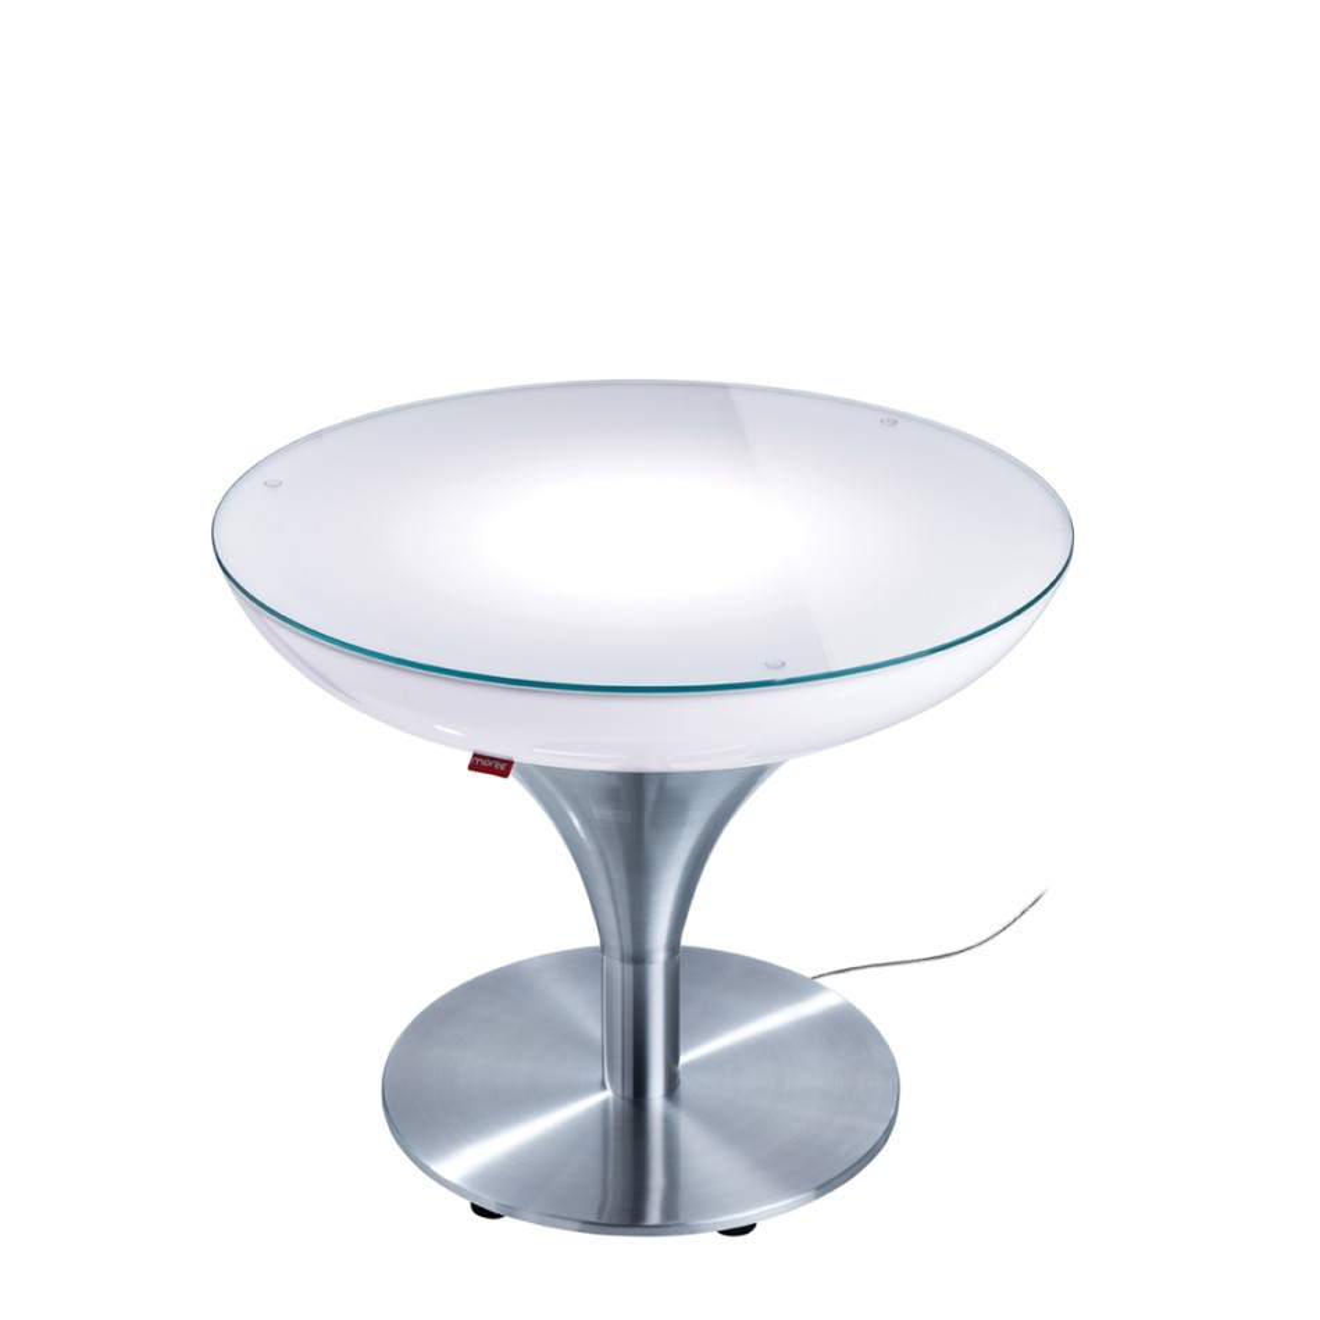 loungetisch lounge m 45 home light exklusives. Black Bedroom Furniture Sets. Home Design Ideas